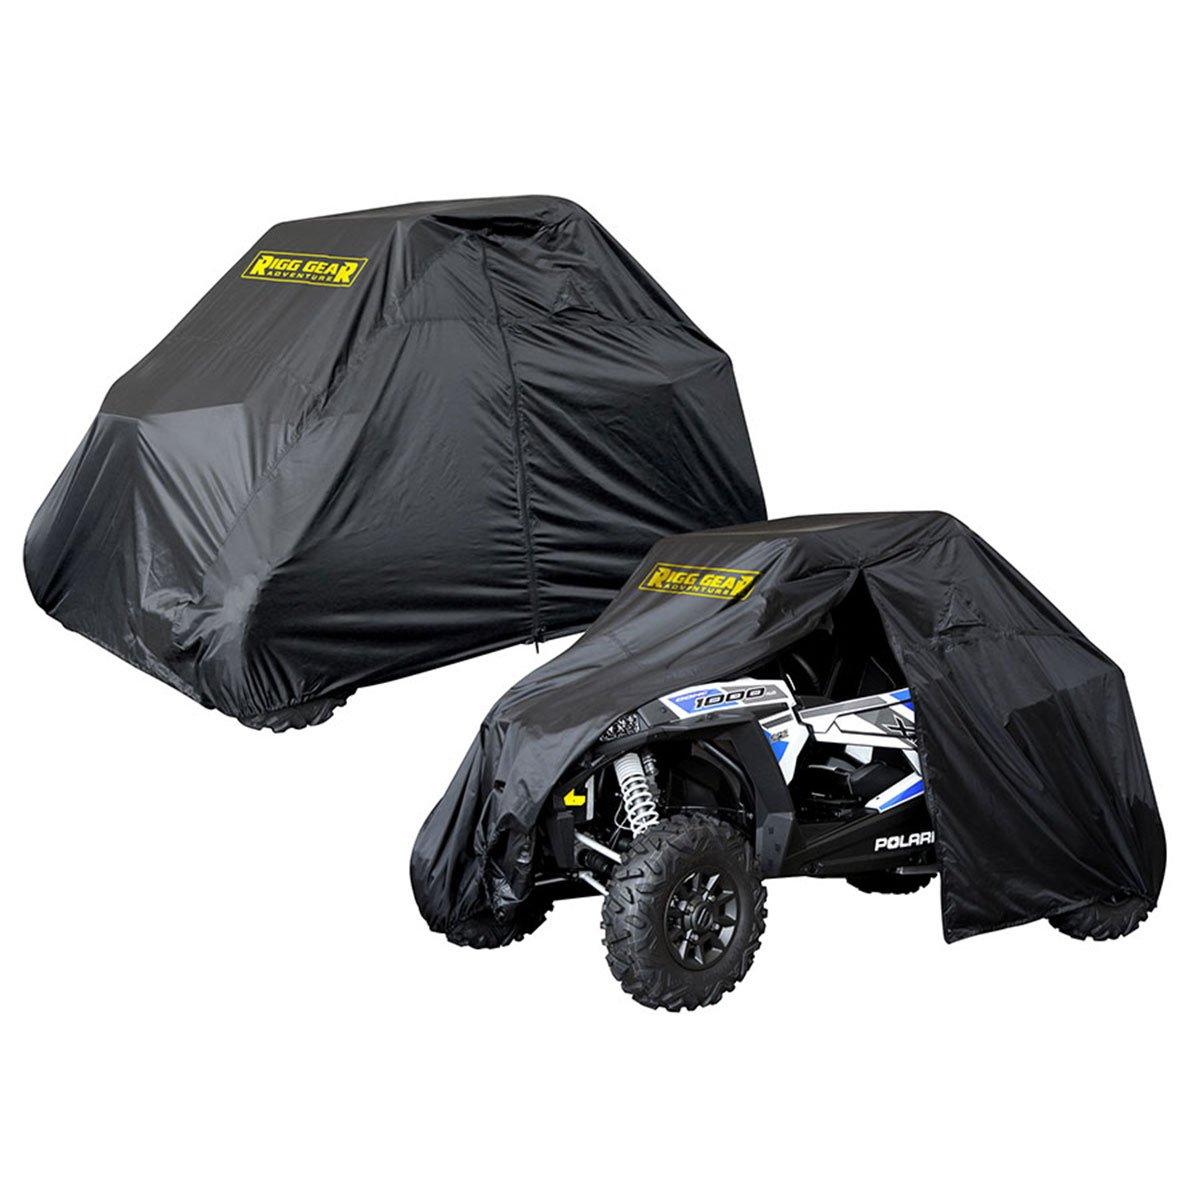 Nelson-Rigg DEX-UTVS-2 Extreme Sport UTV 4 Seat Motorcycle Cover - Black / One Size